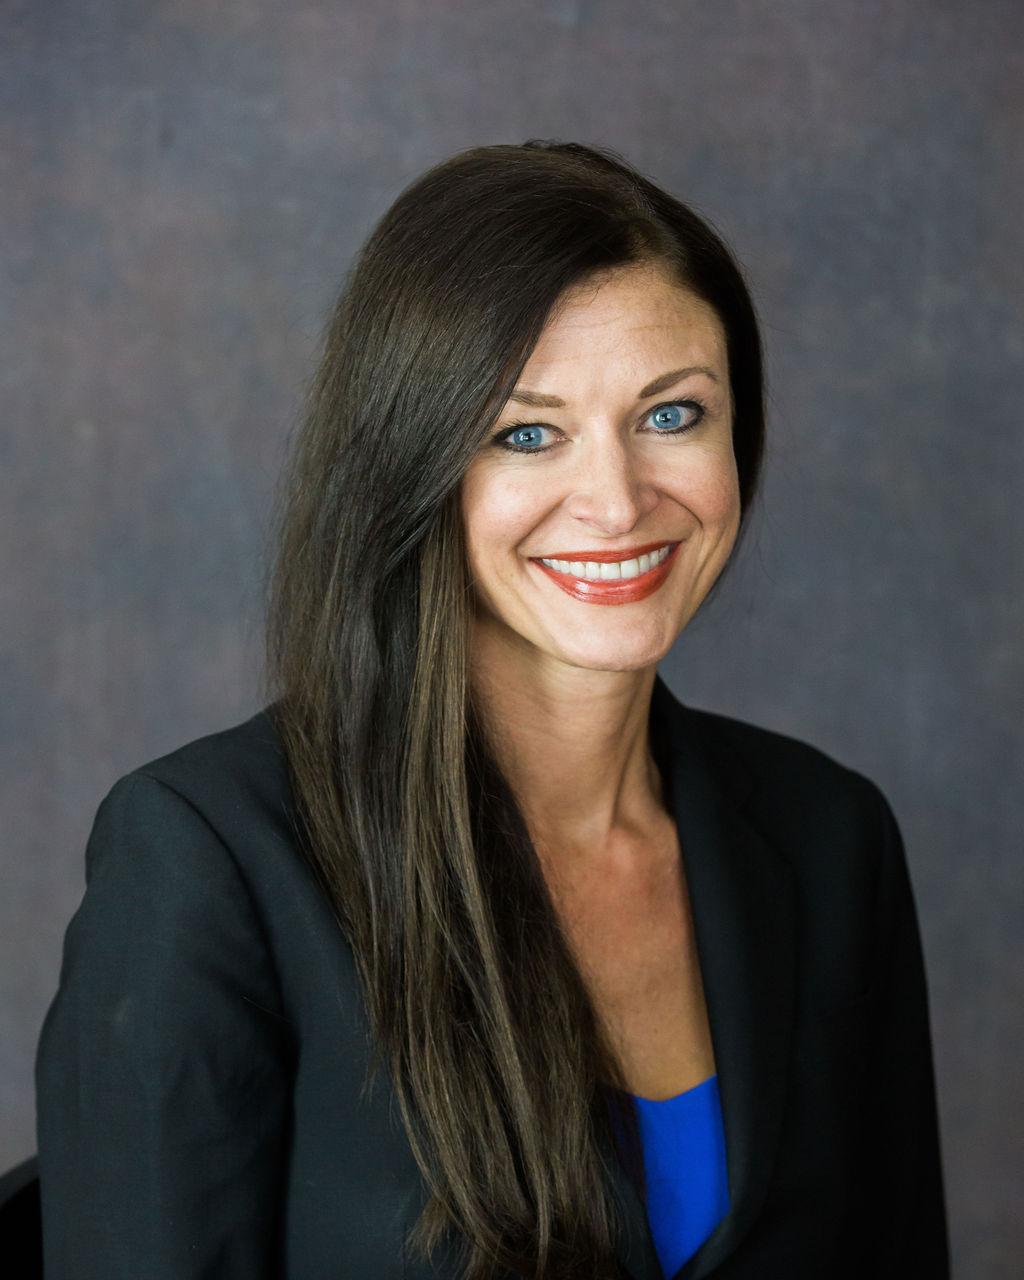 Lindsey Mitchell